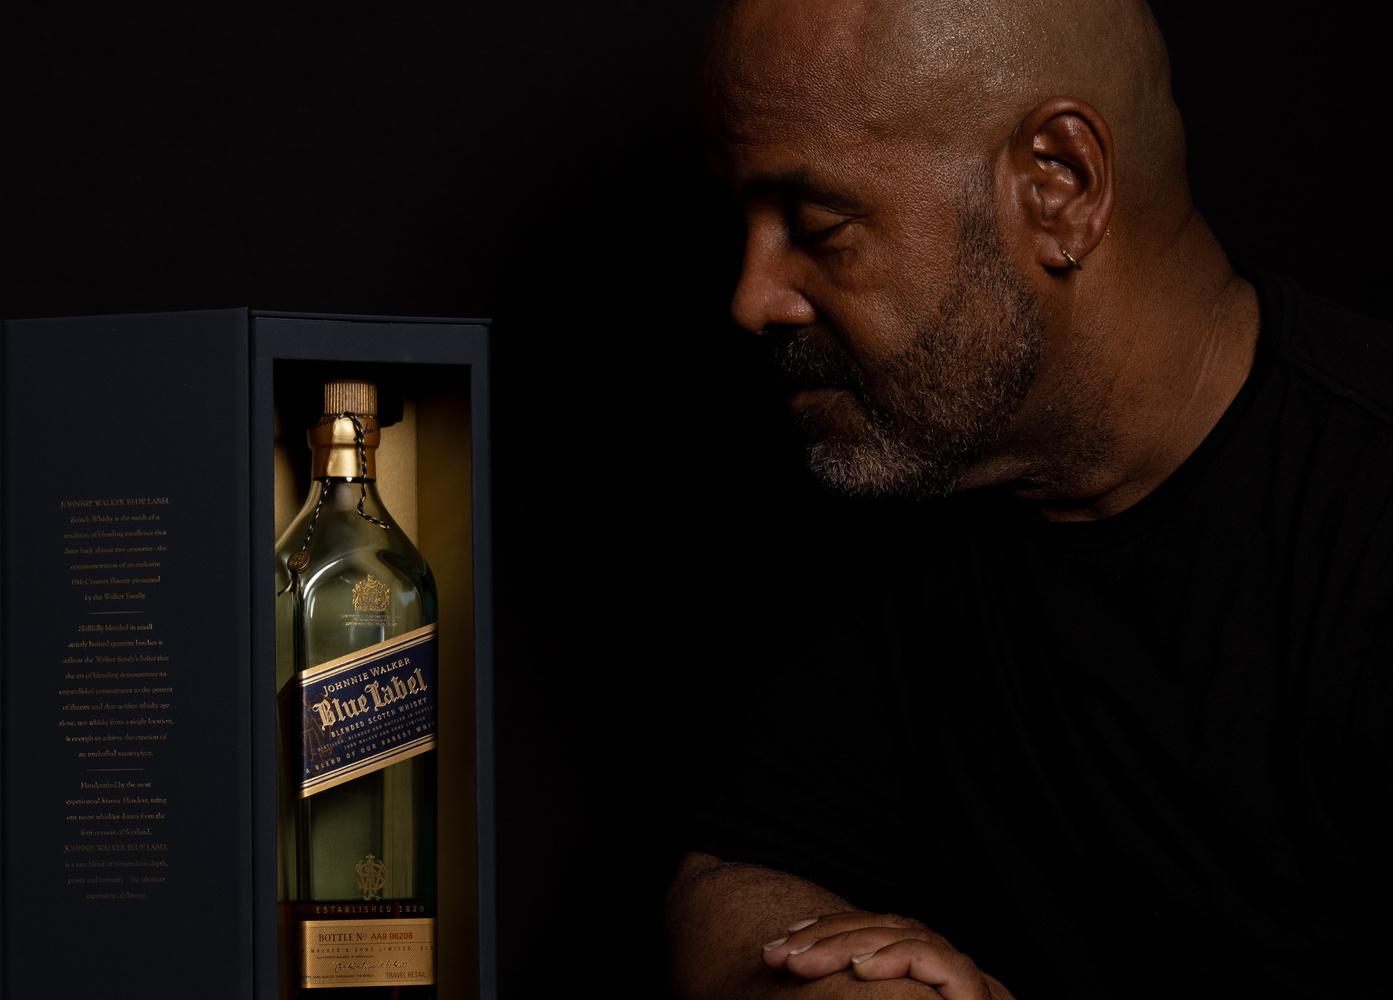 Johnnie Blue 🥃 by John Jackson